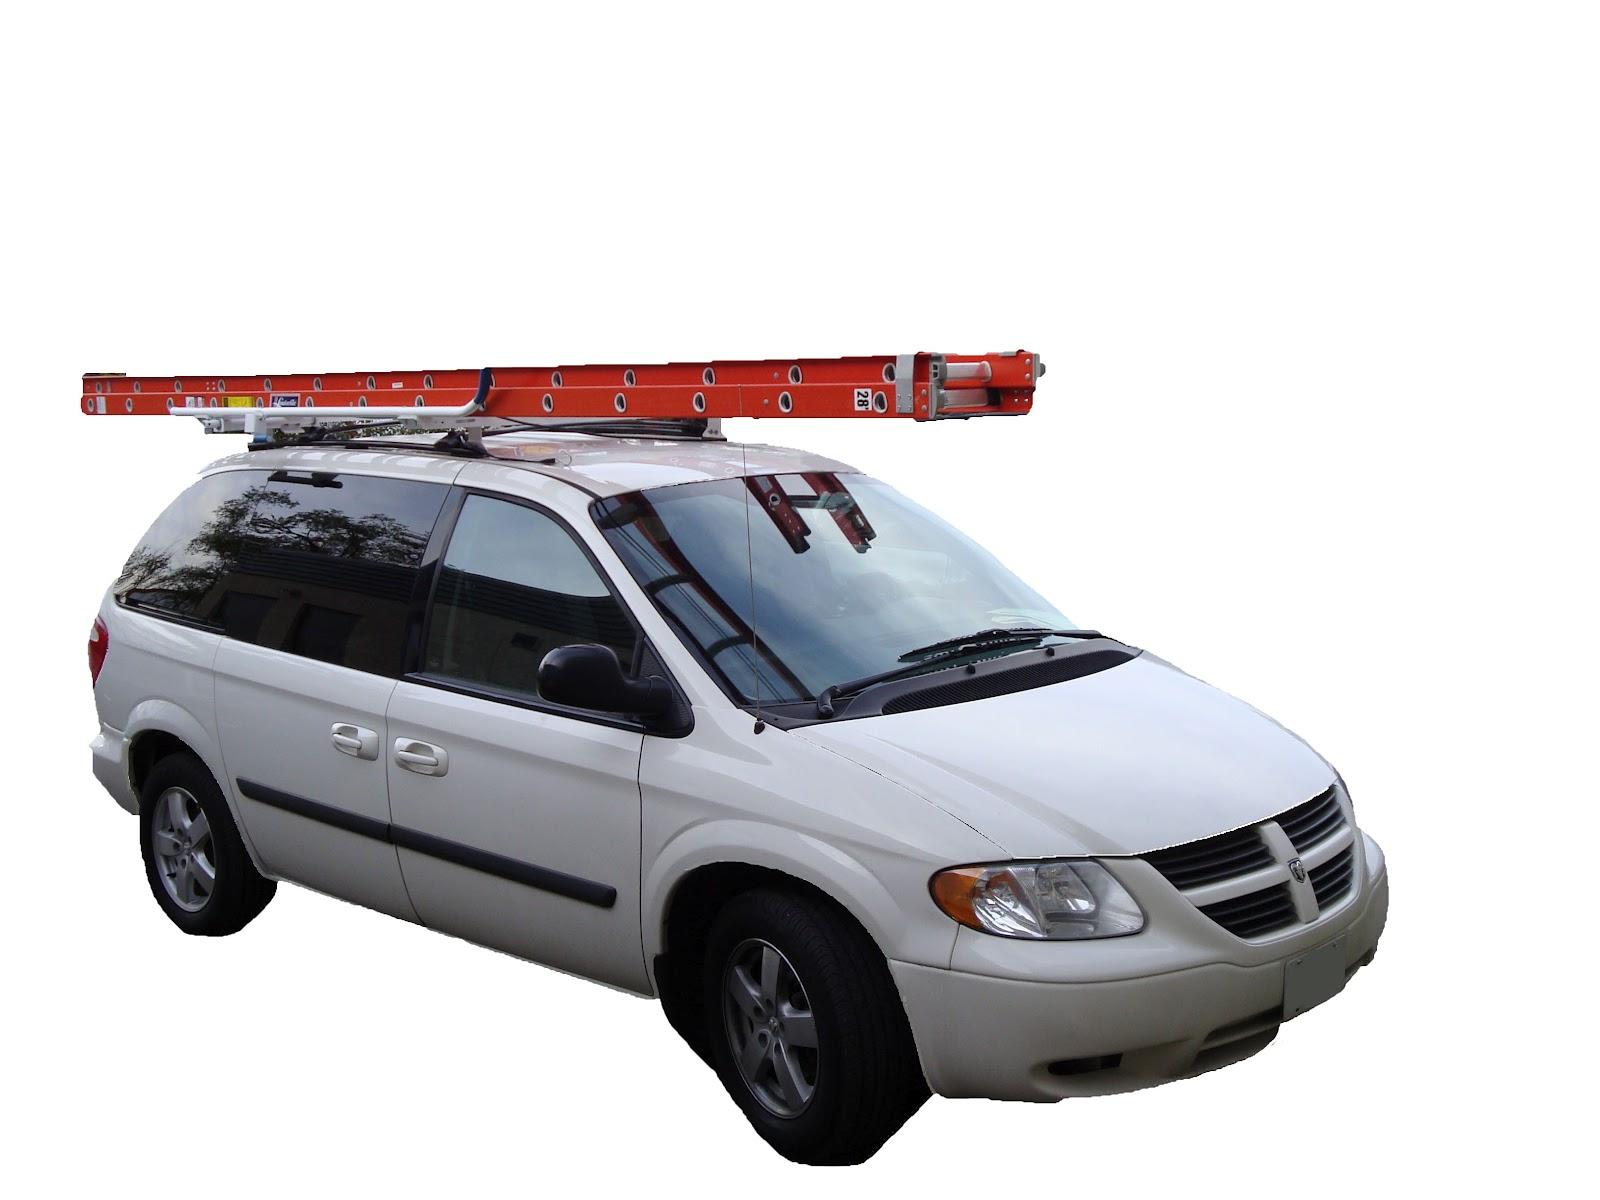 Dodge Caravan, Dodge Grand Caravan Ladder Racks